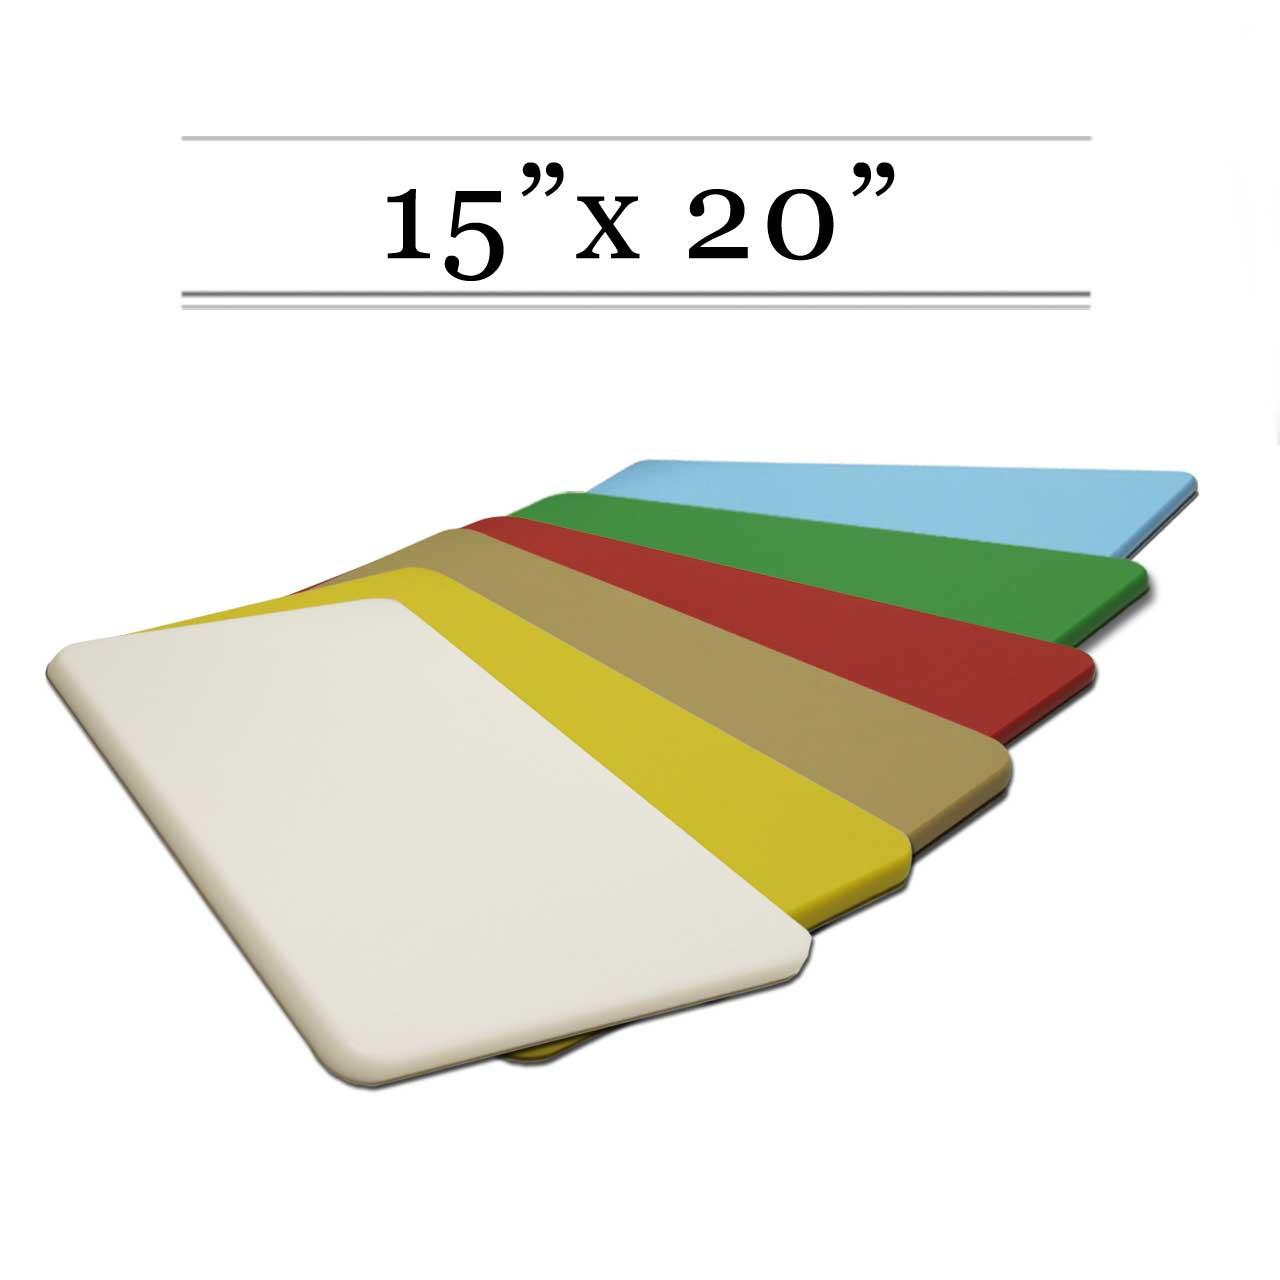 6 cutting board set